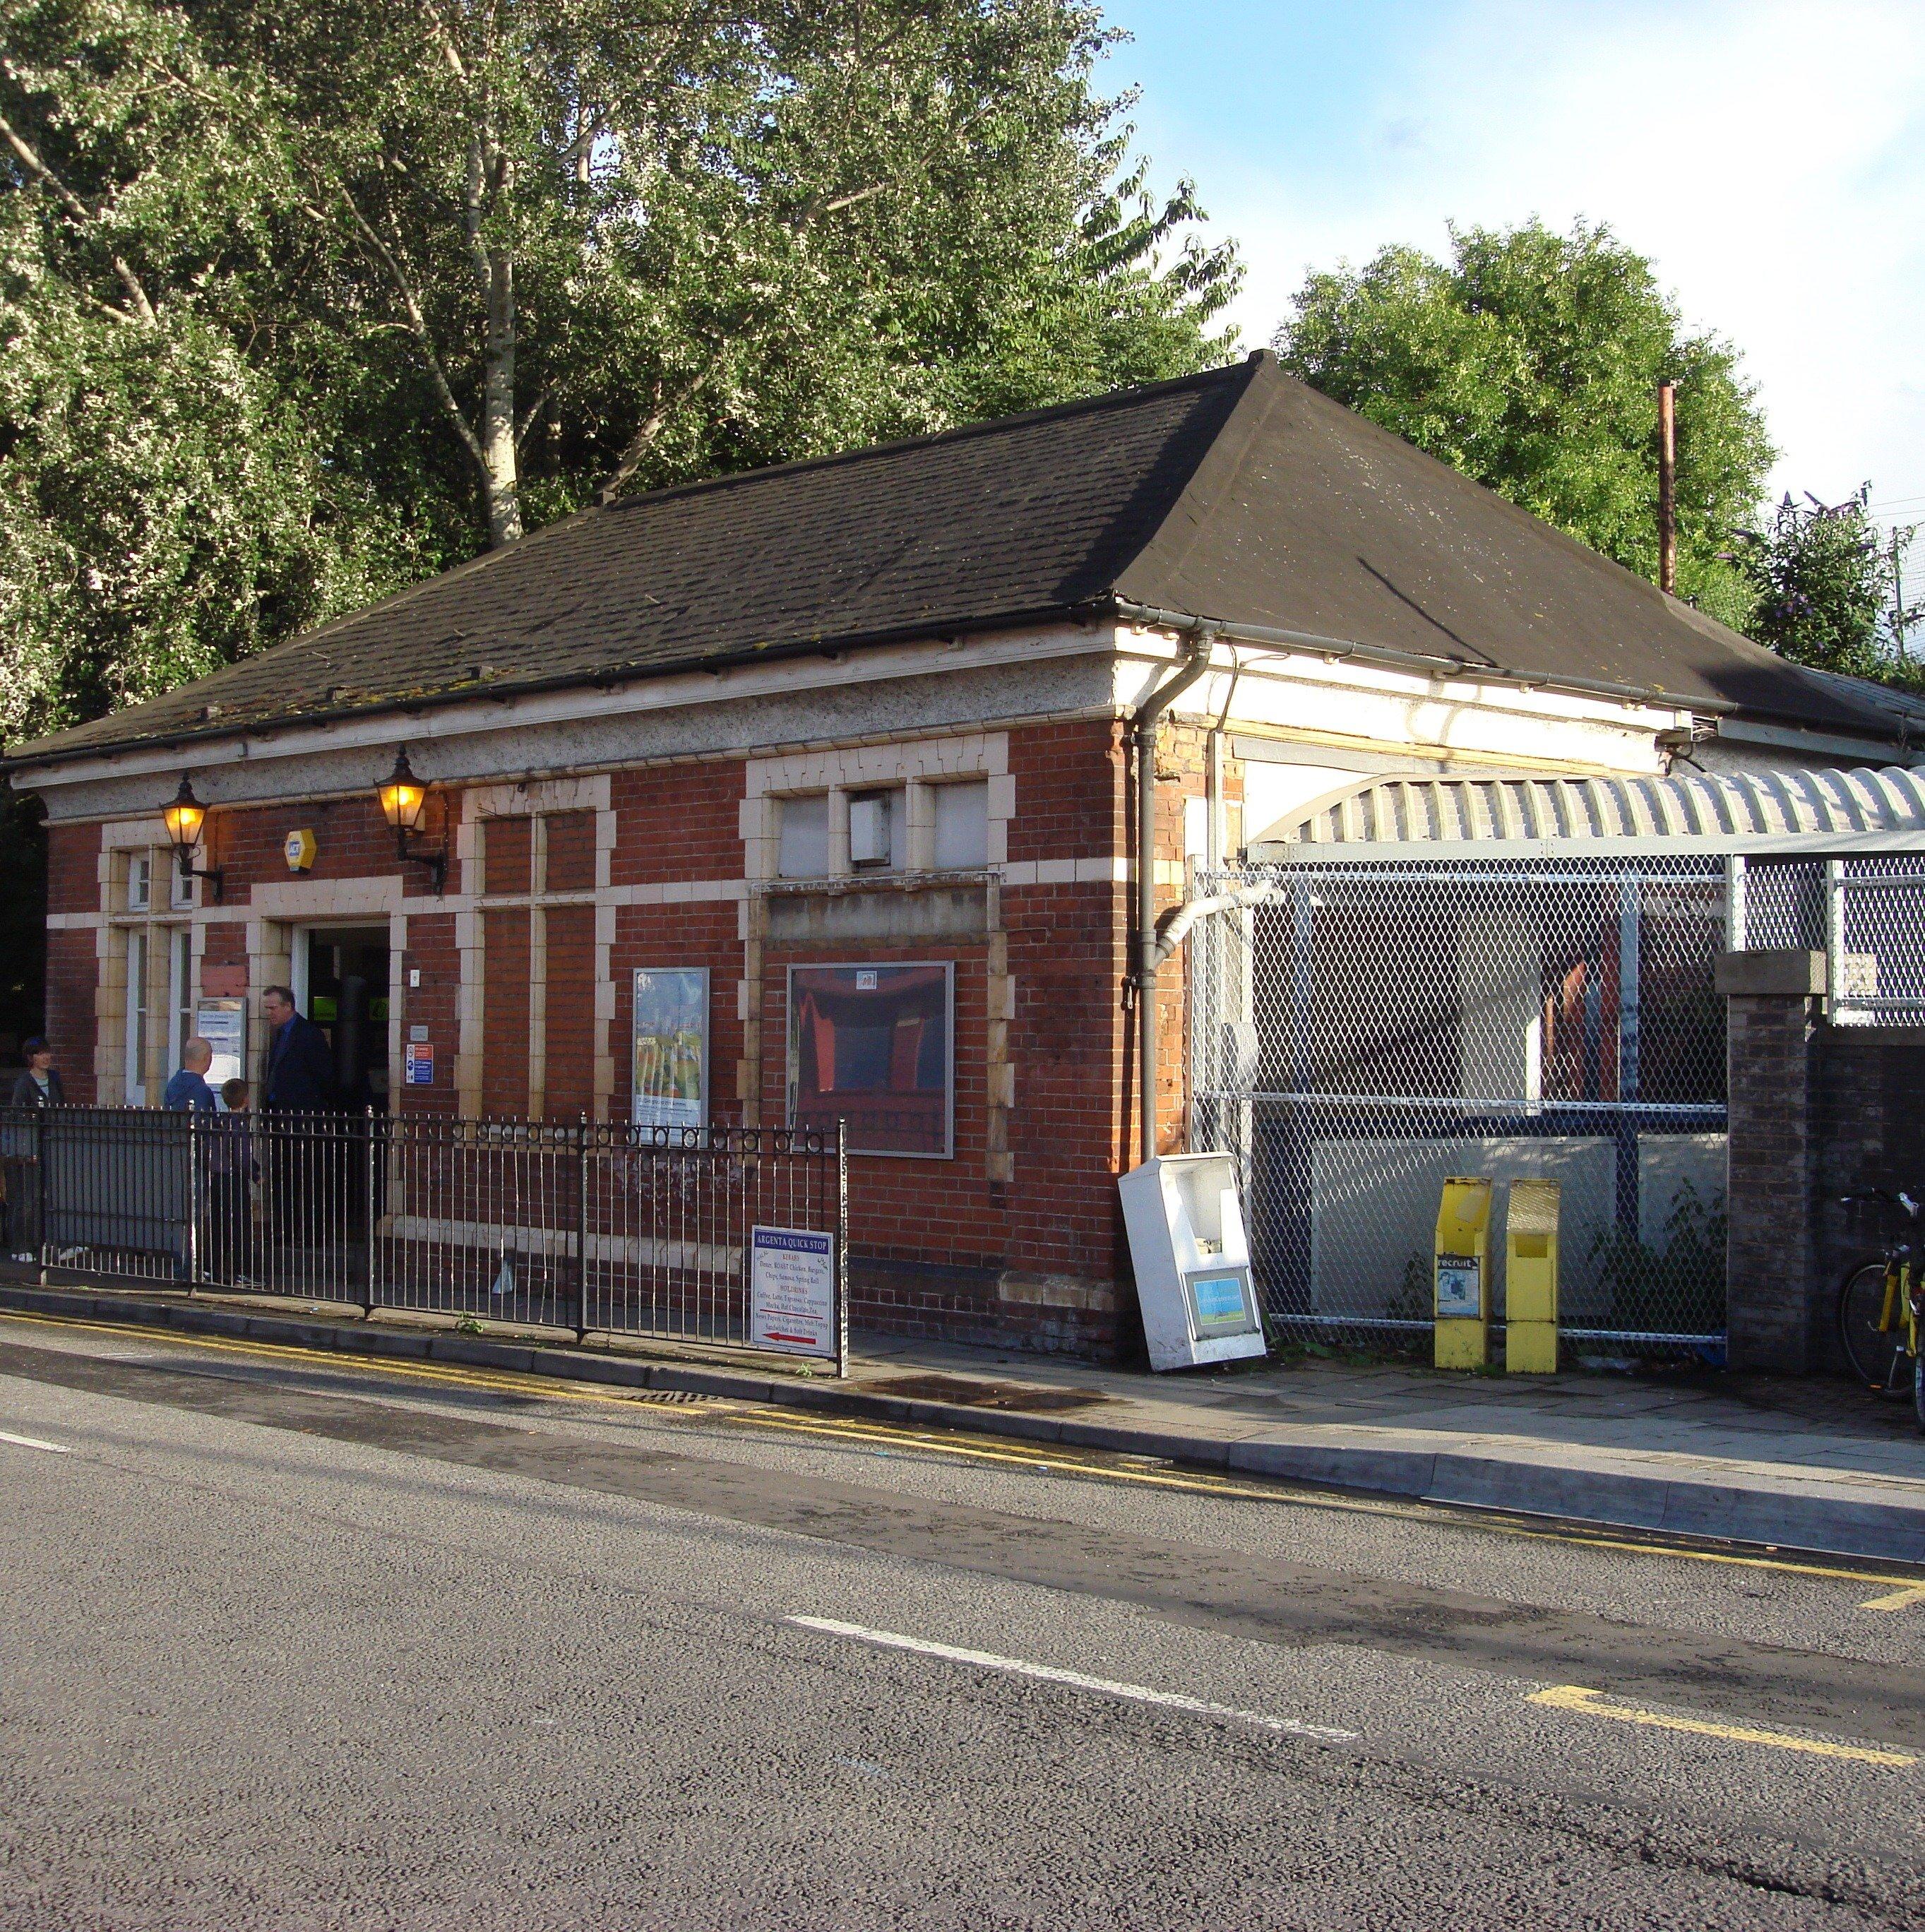 Stonebridge Park station 1 The 20 Worst Tube Stations In London